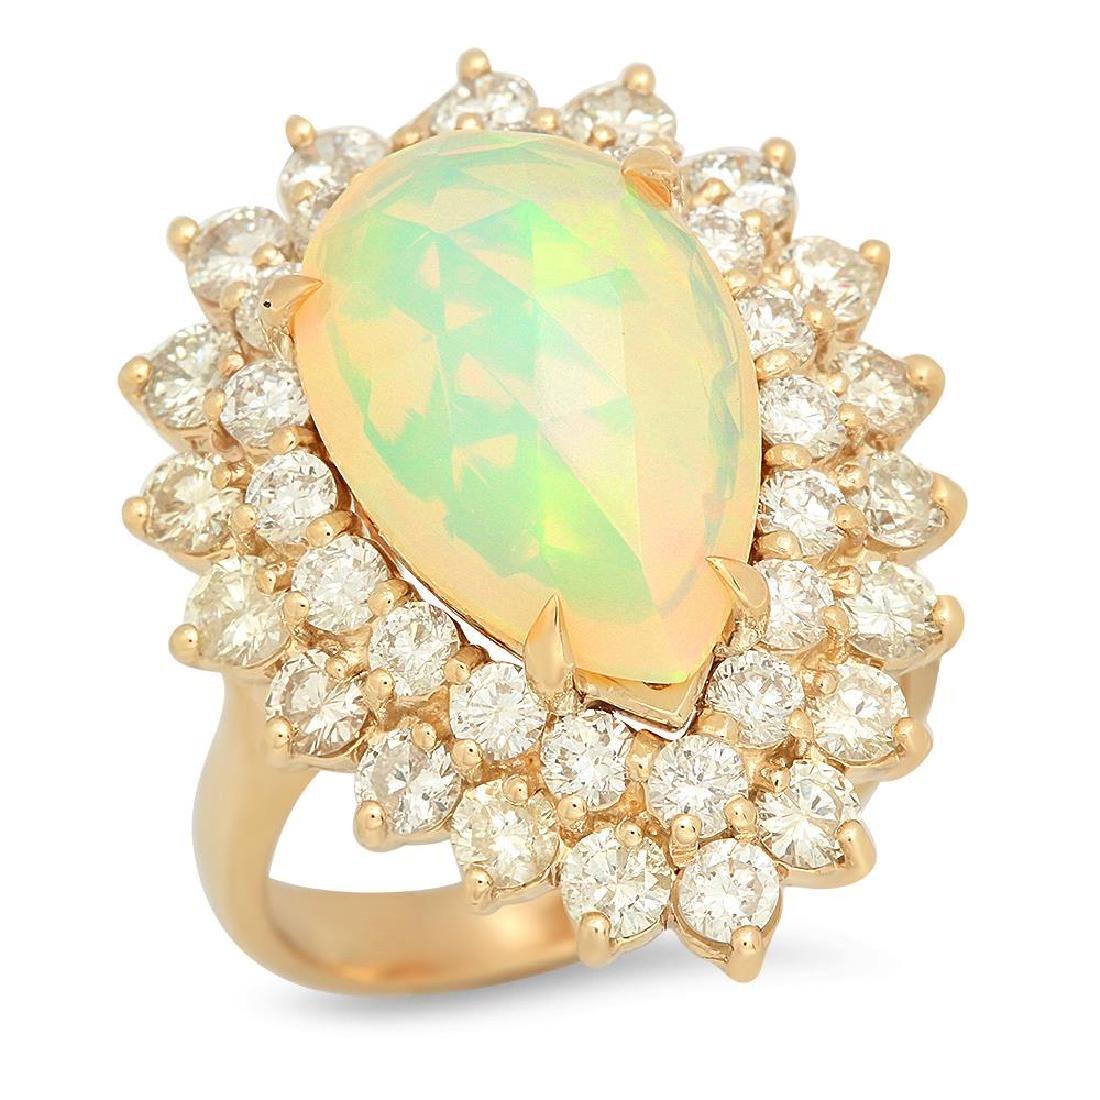 14K Gold 4.42ct Opal 2.55cts Diamond Ring